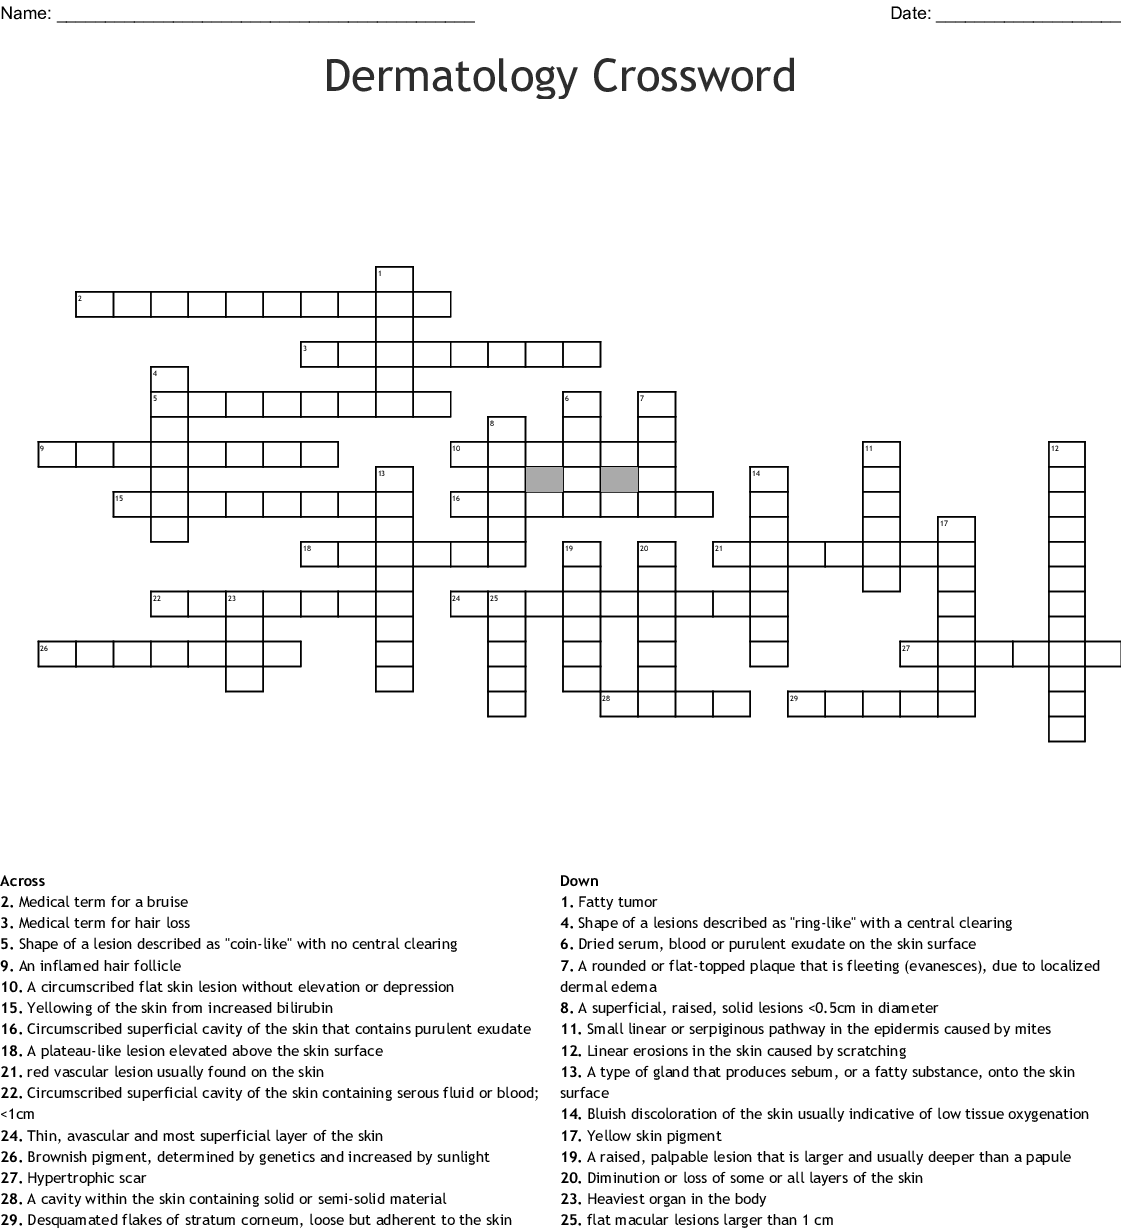 Integumentary Assessment Crossword - WordMint